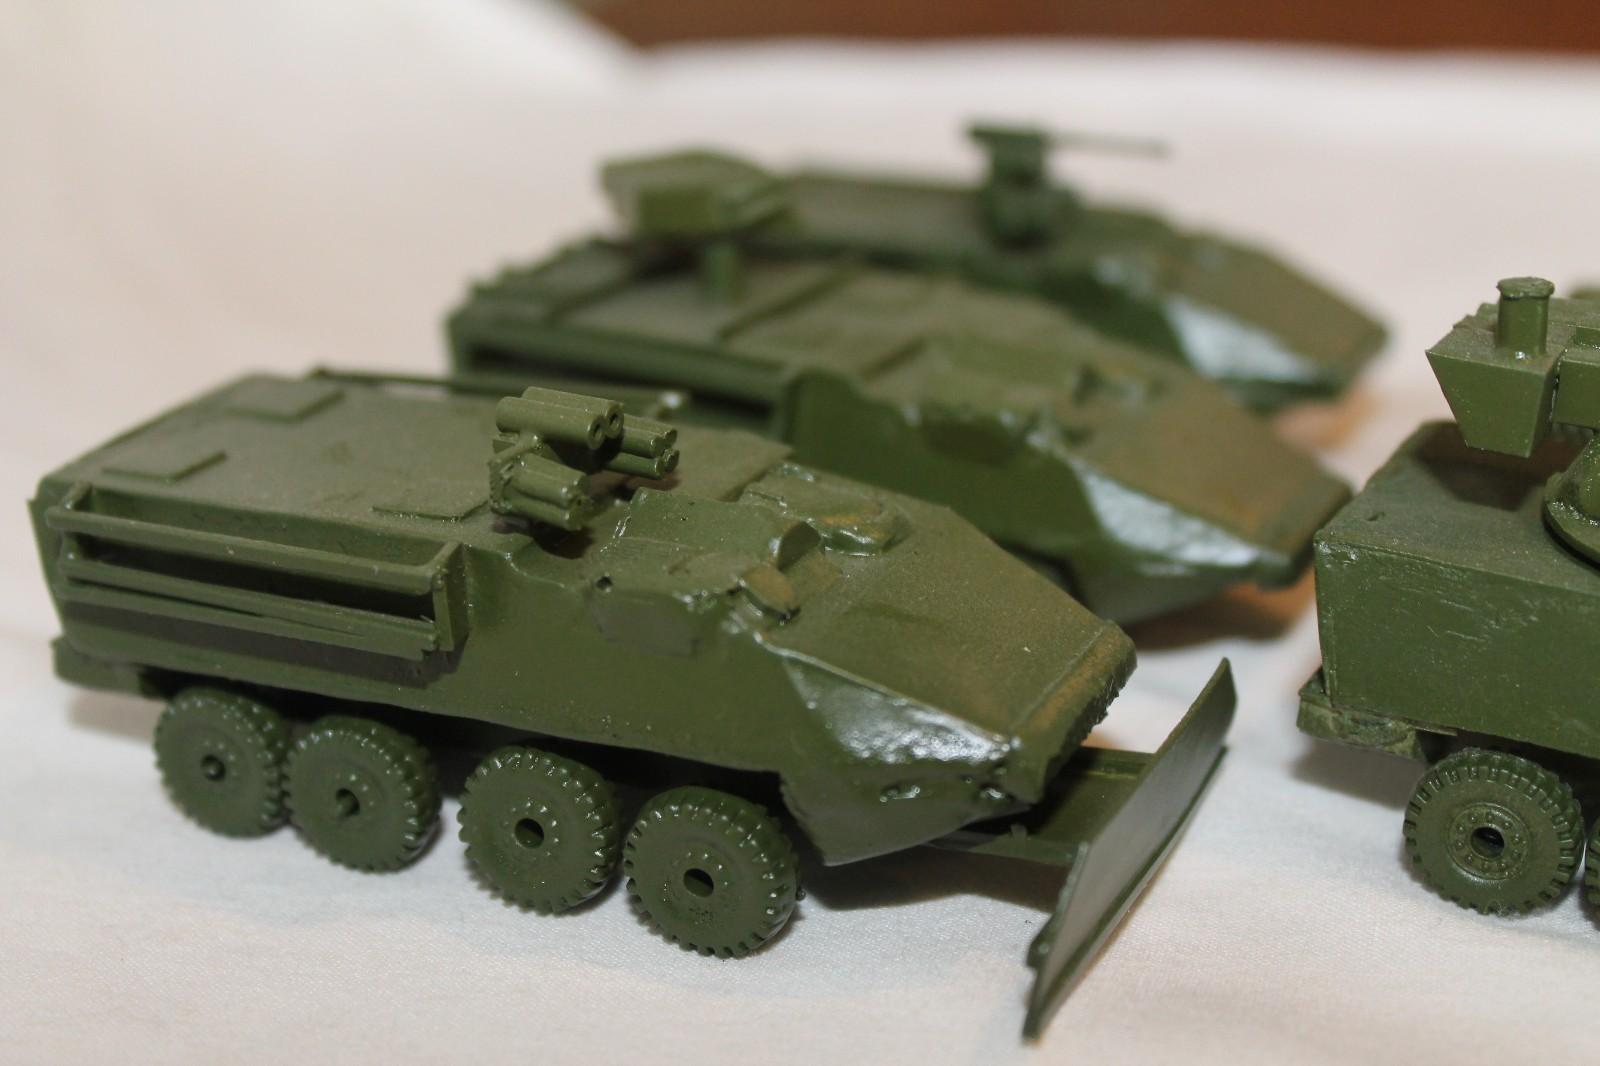 Stryker Army Vehicle Training